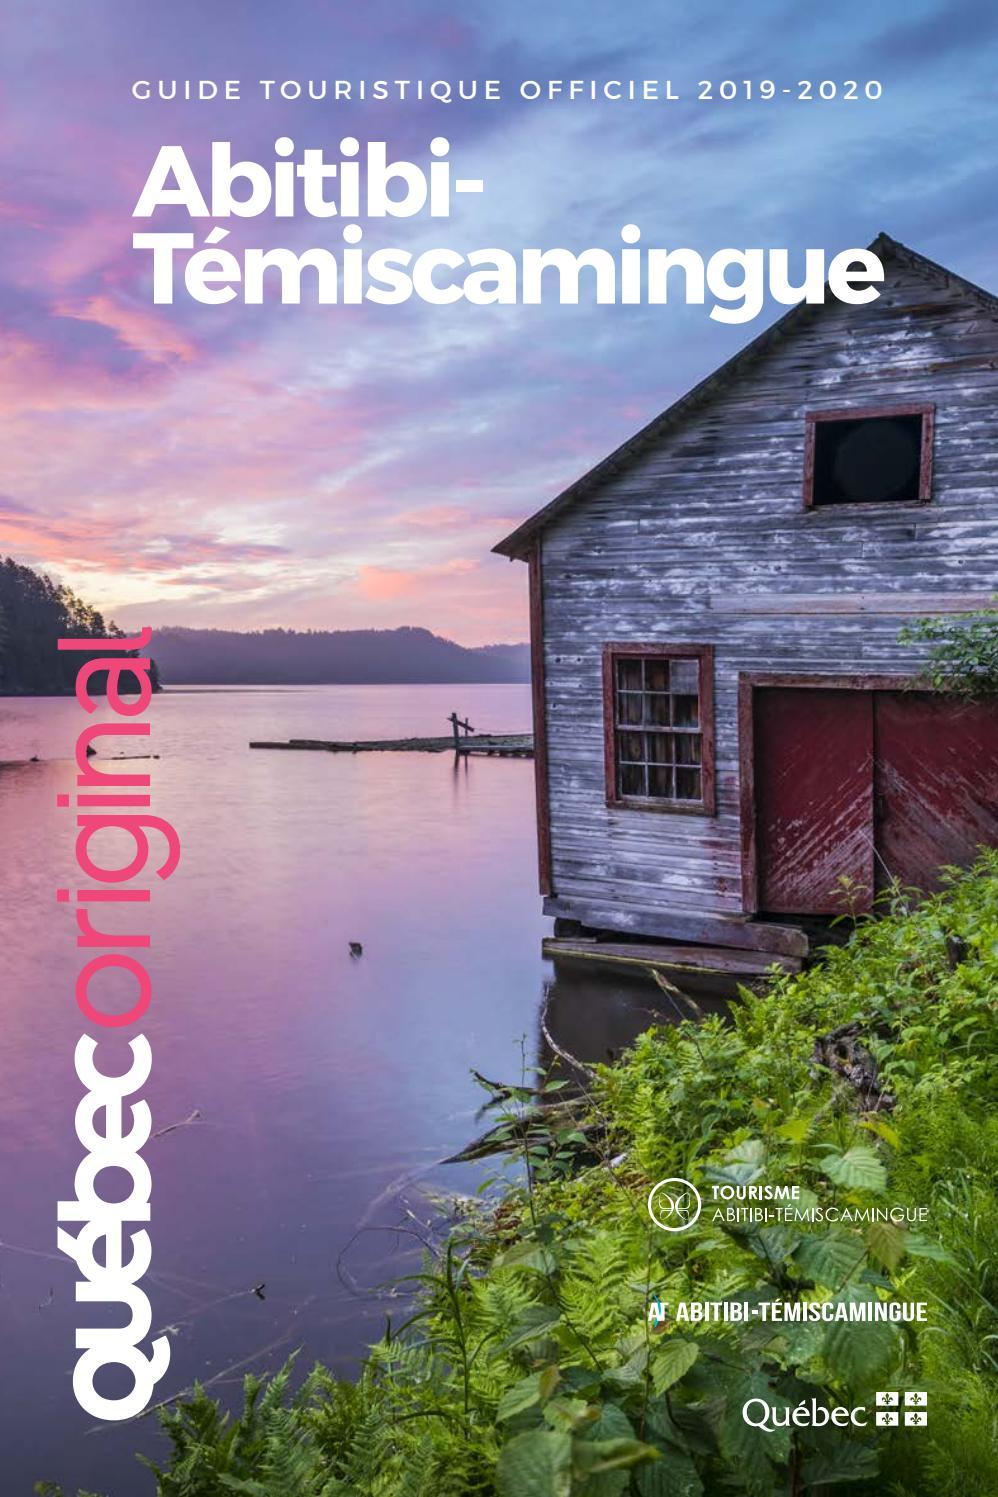 Guide Touristique By Tourisme Abitibi Témiscamingue   Issuu